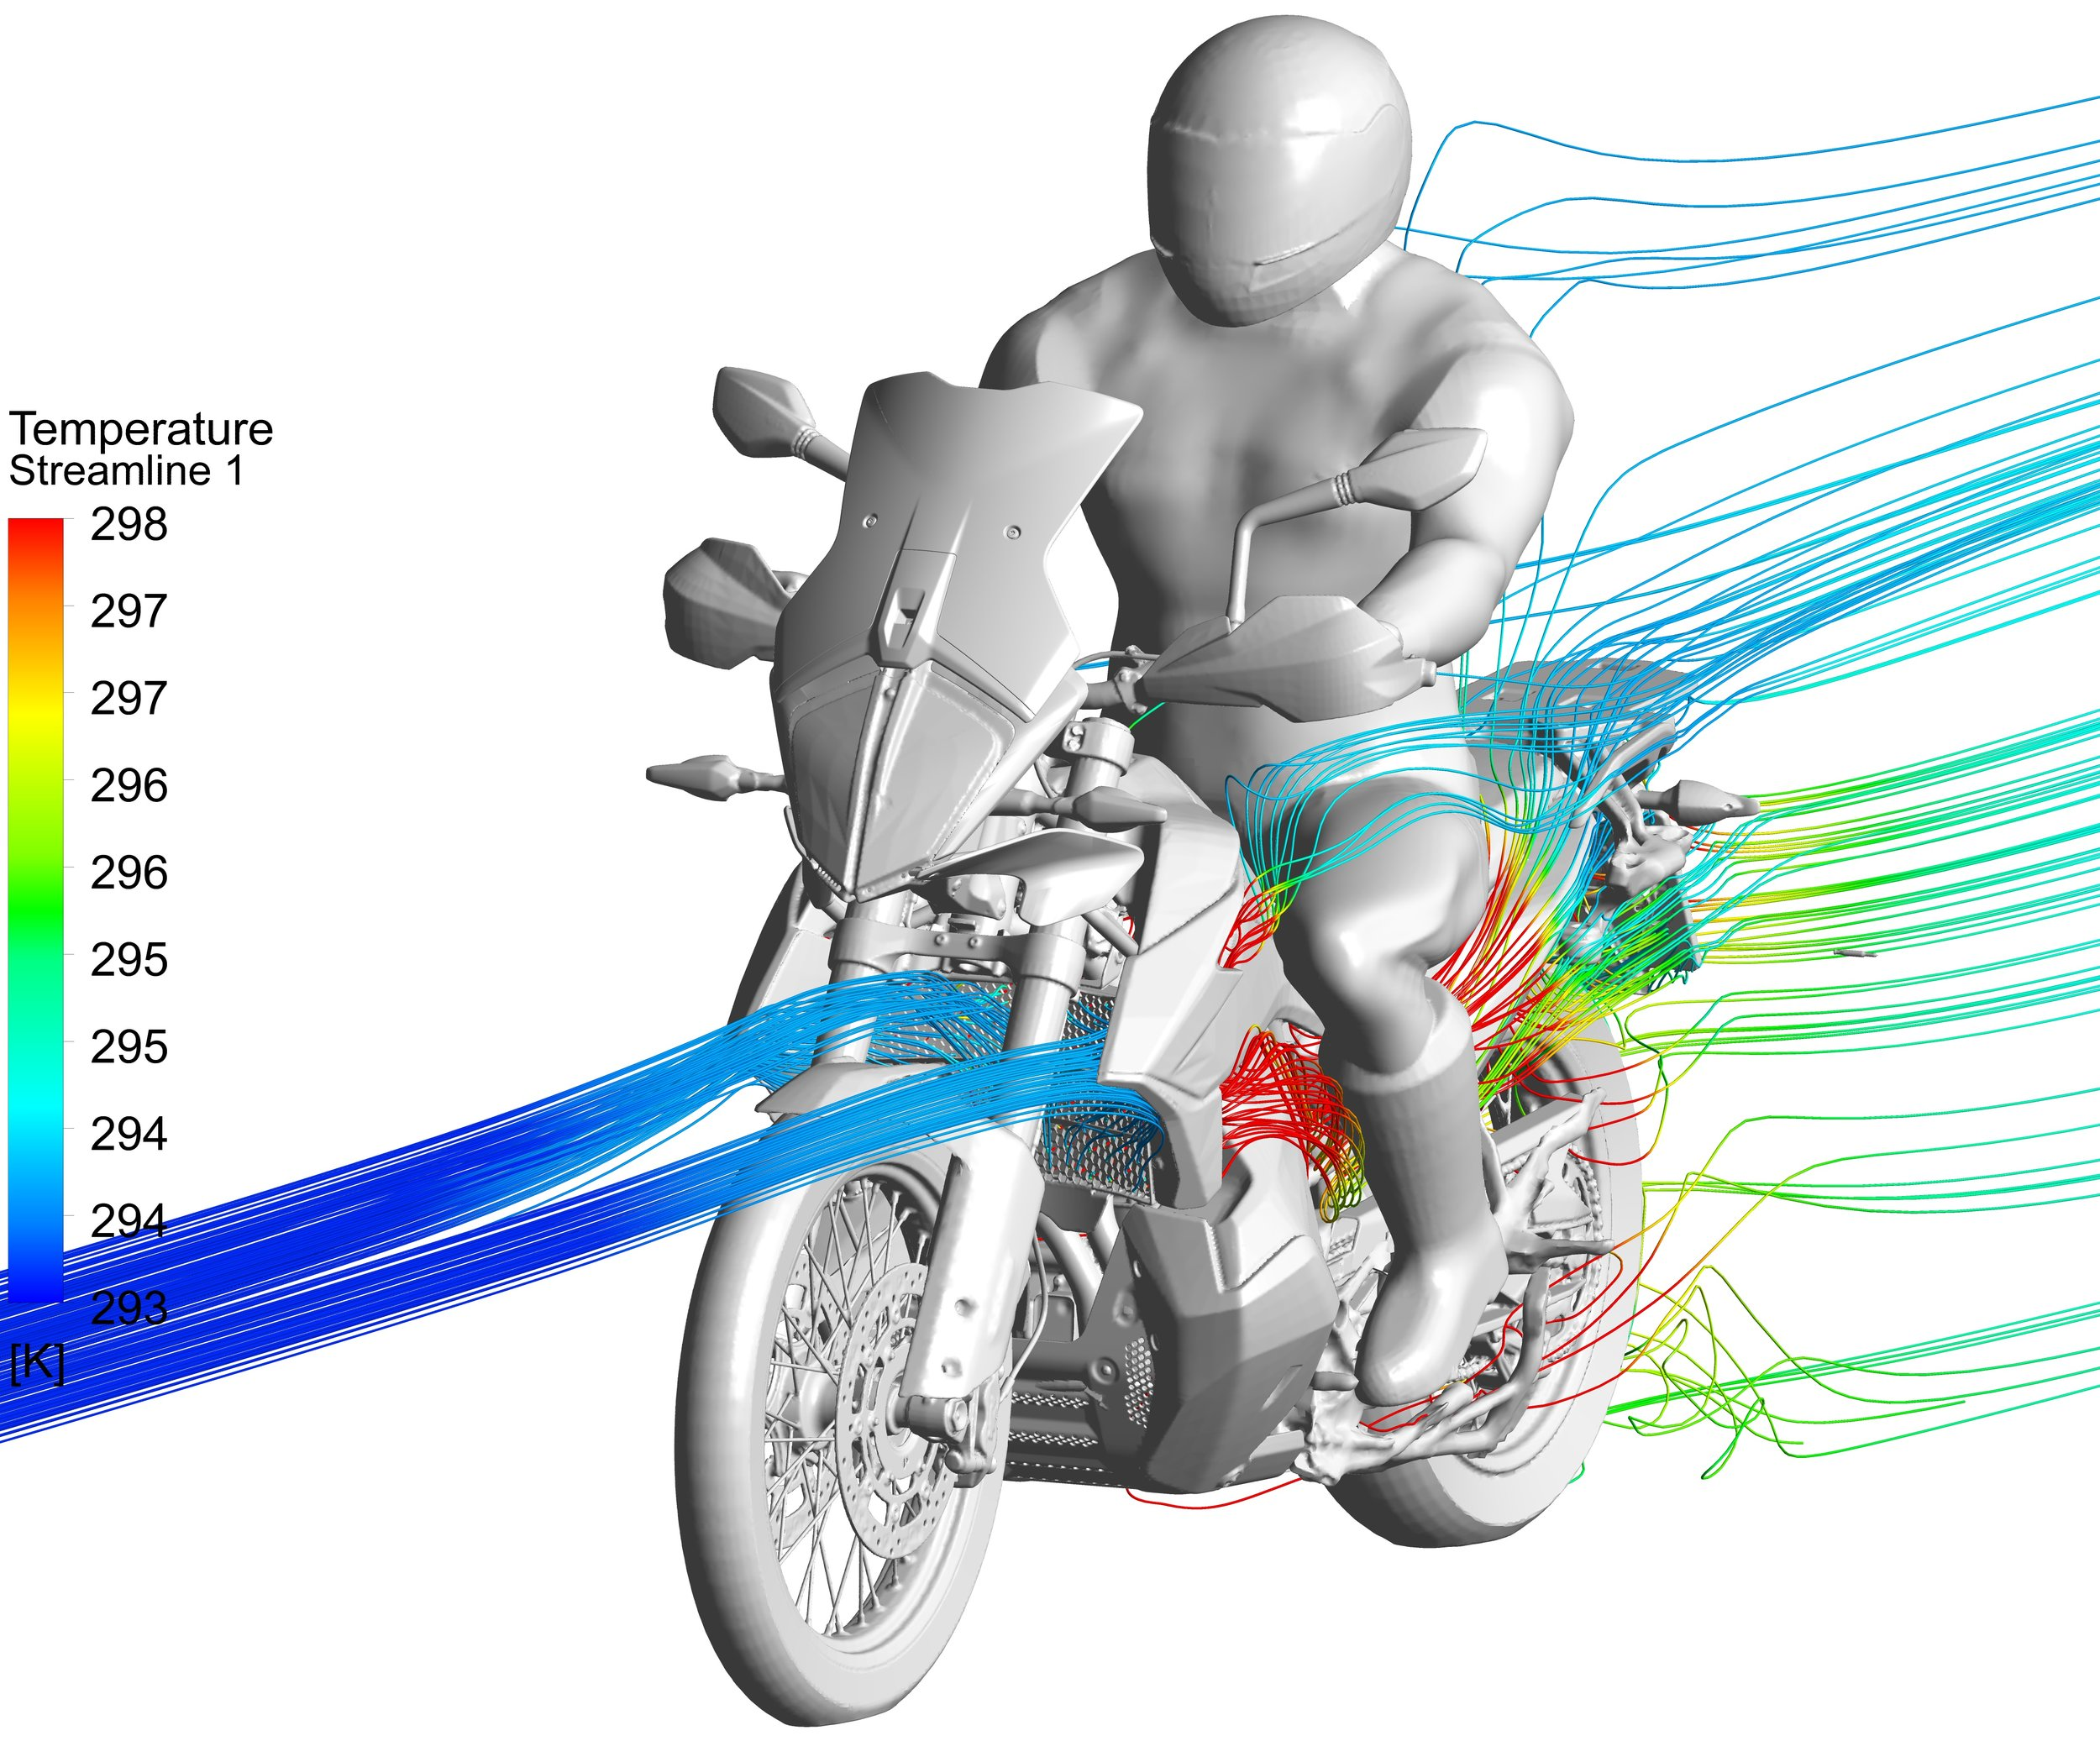 KTM 790 ADV_Thermodynamics.jpg